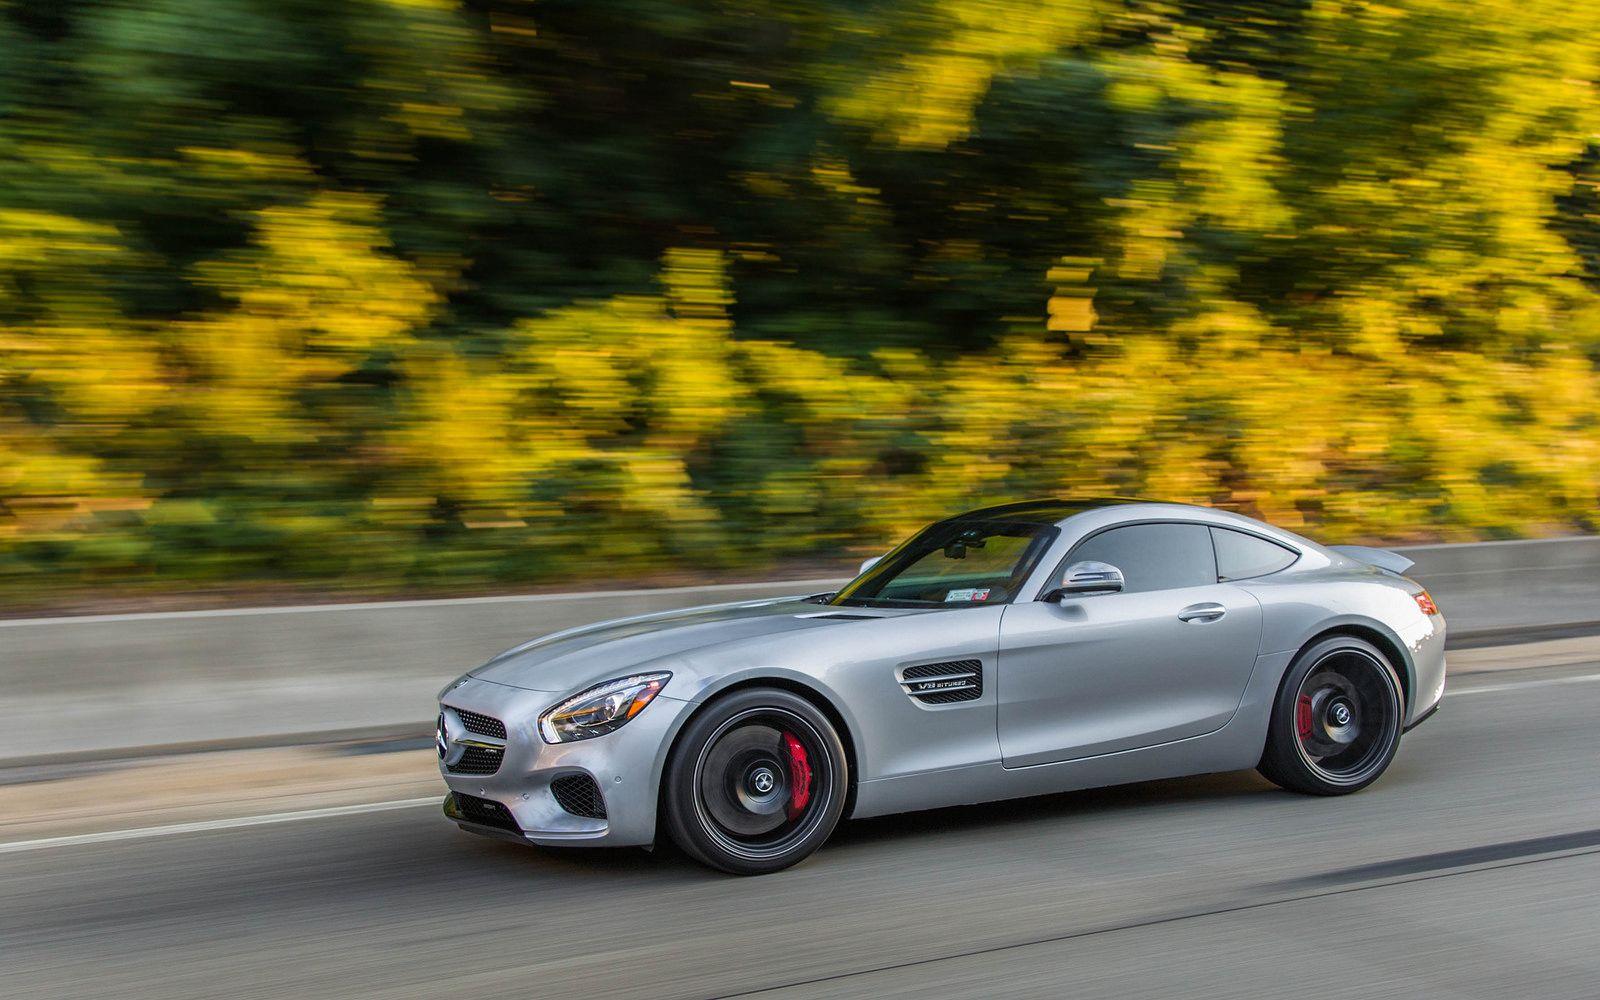 A Mercedes-AMG GT S on the move [OC][2048x1280] - via Cly Bro ... on